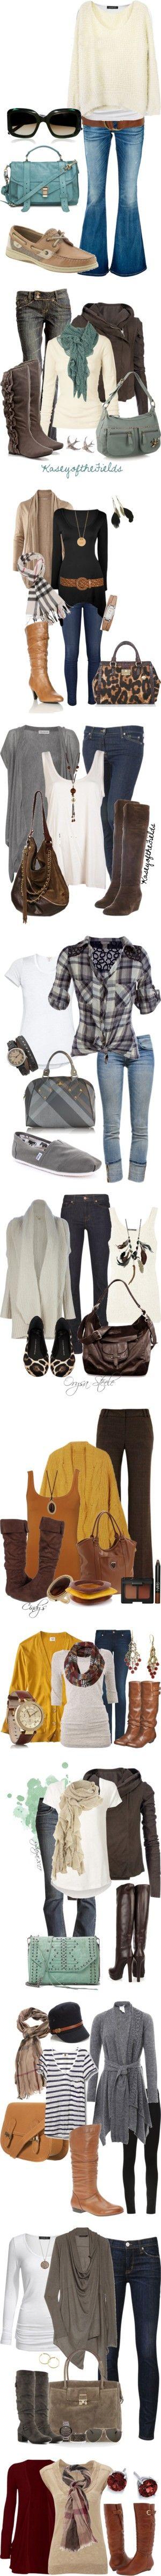 Fall/Winter Styles